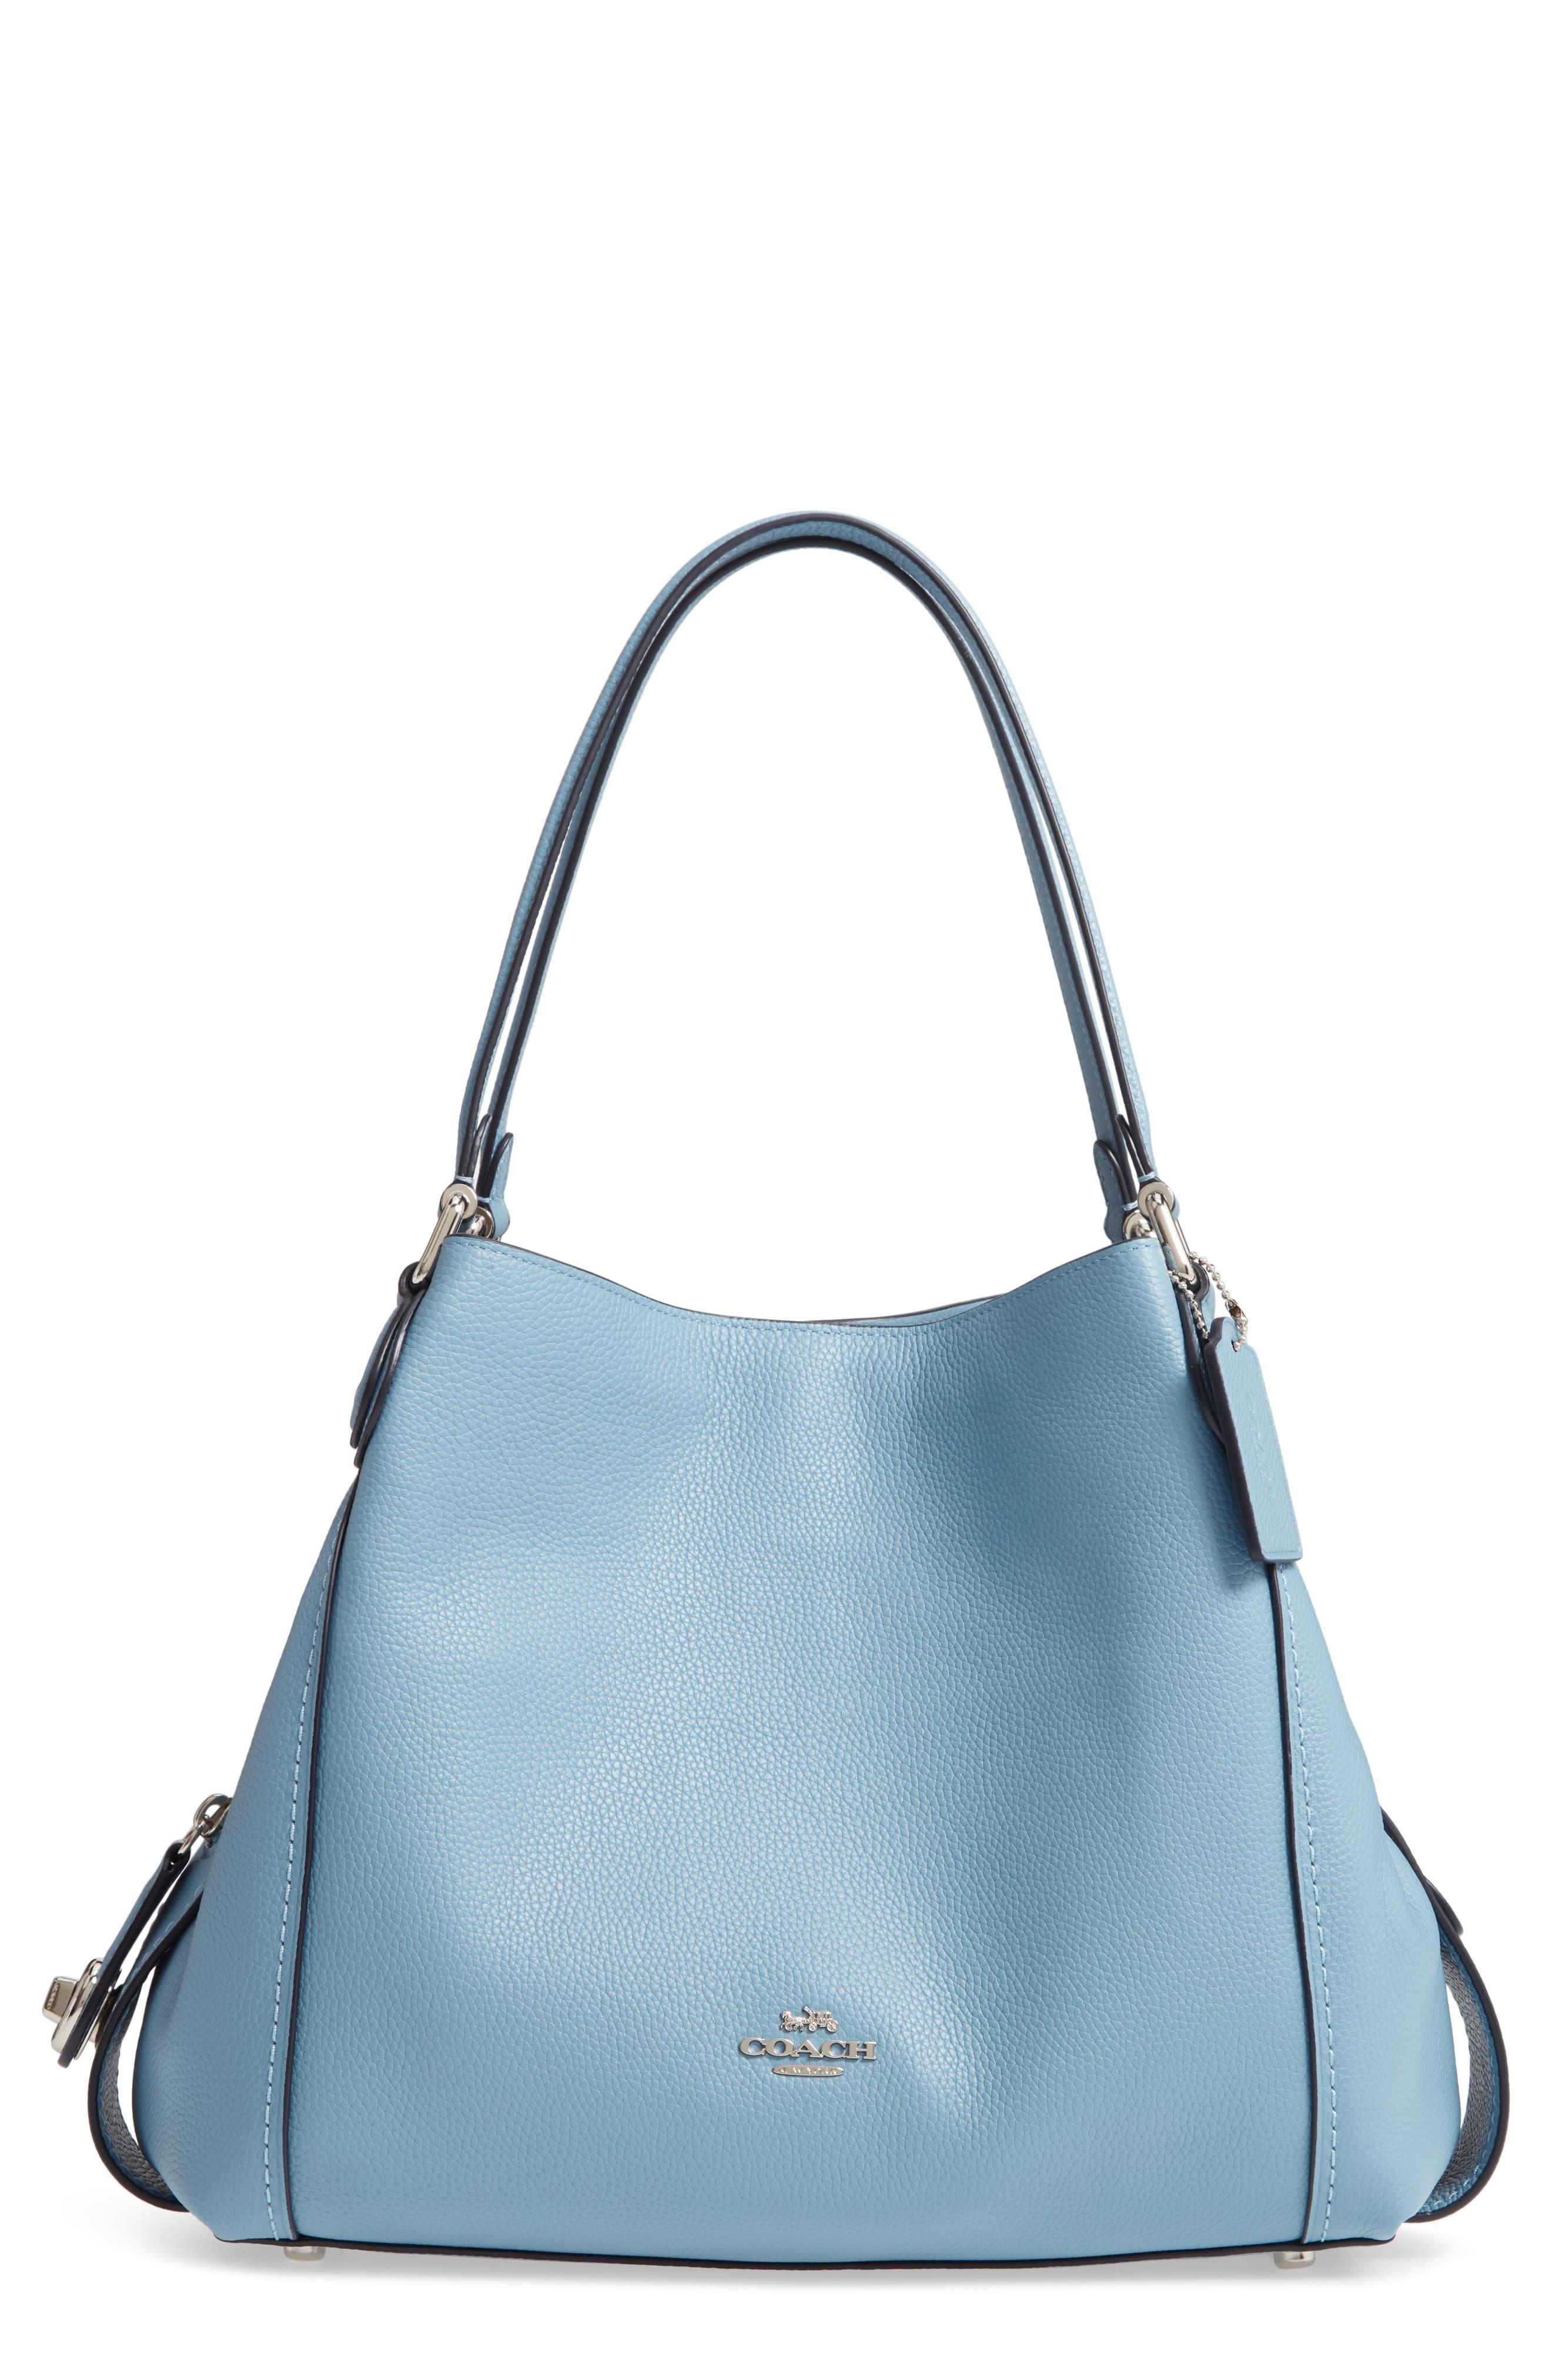 5eb572fdb7bec COACH Edie 31 Pebbled Leather Shoulder Bag in Blue - Lyst